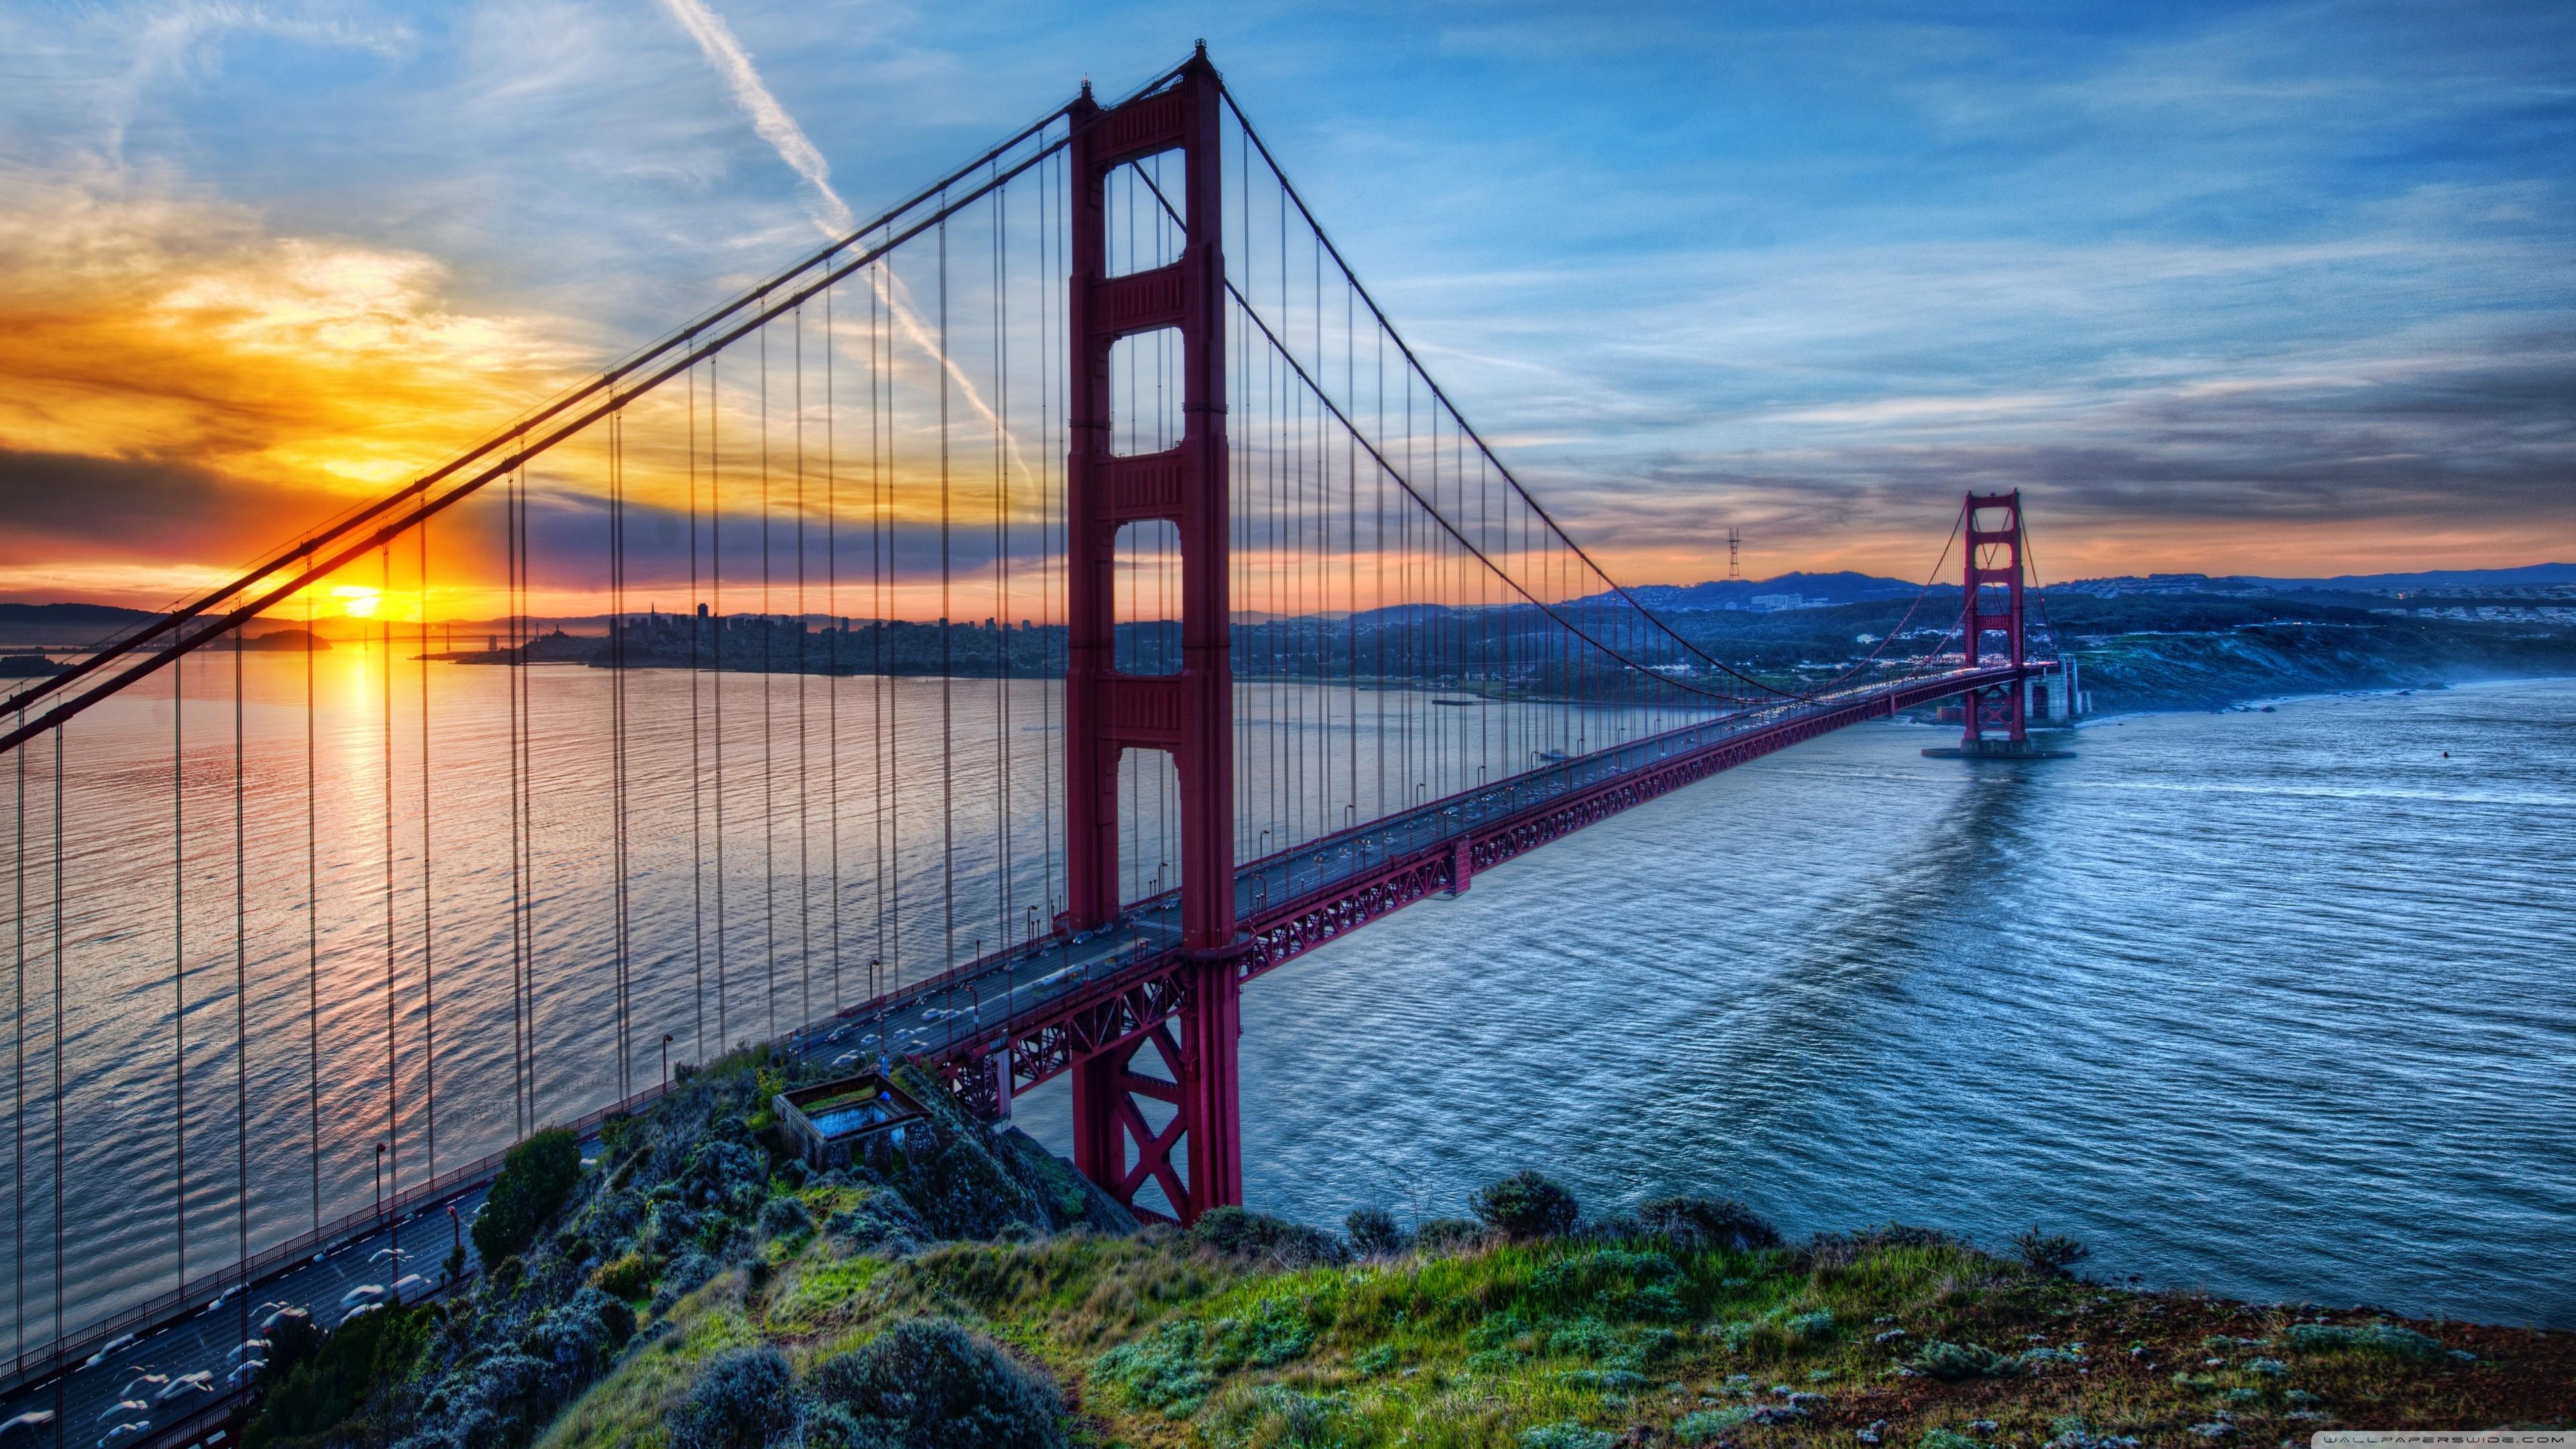 San Francisco 4k Wallpaper 59 Images